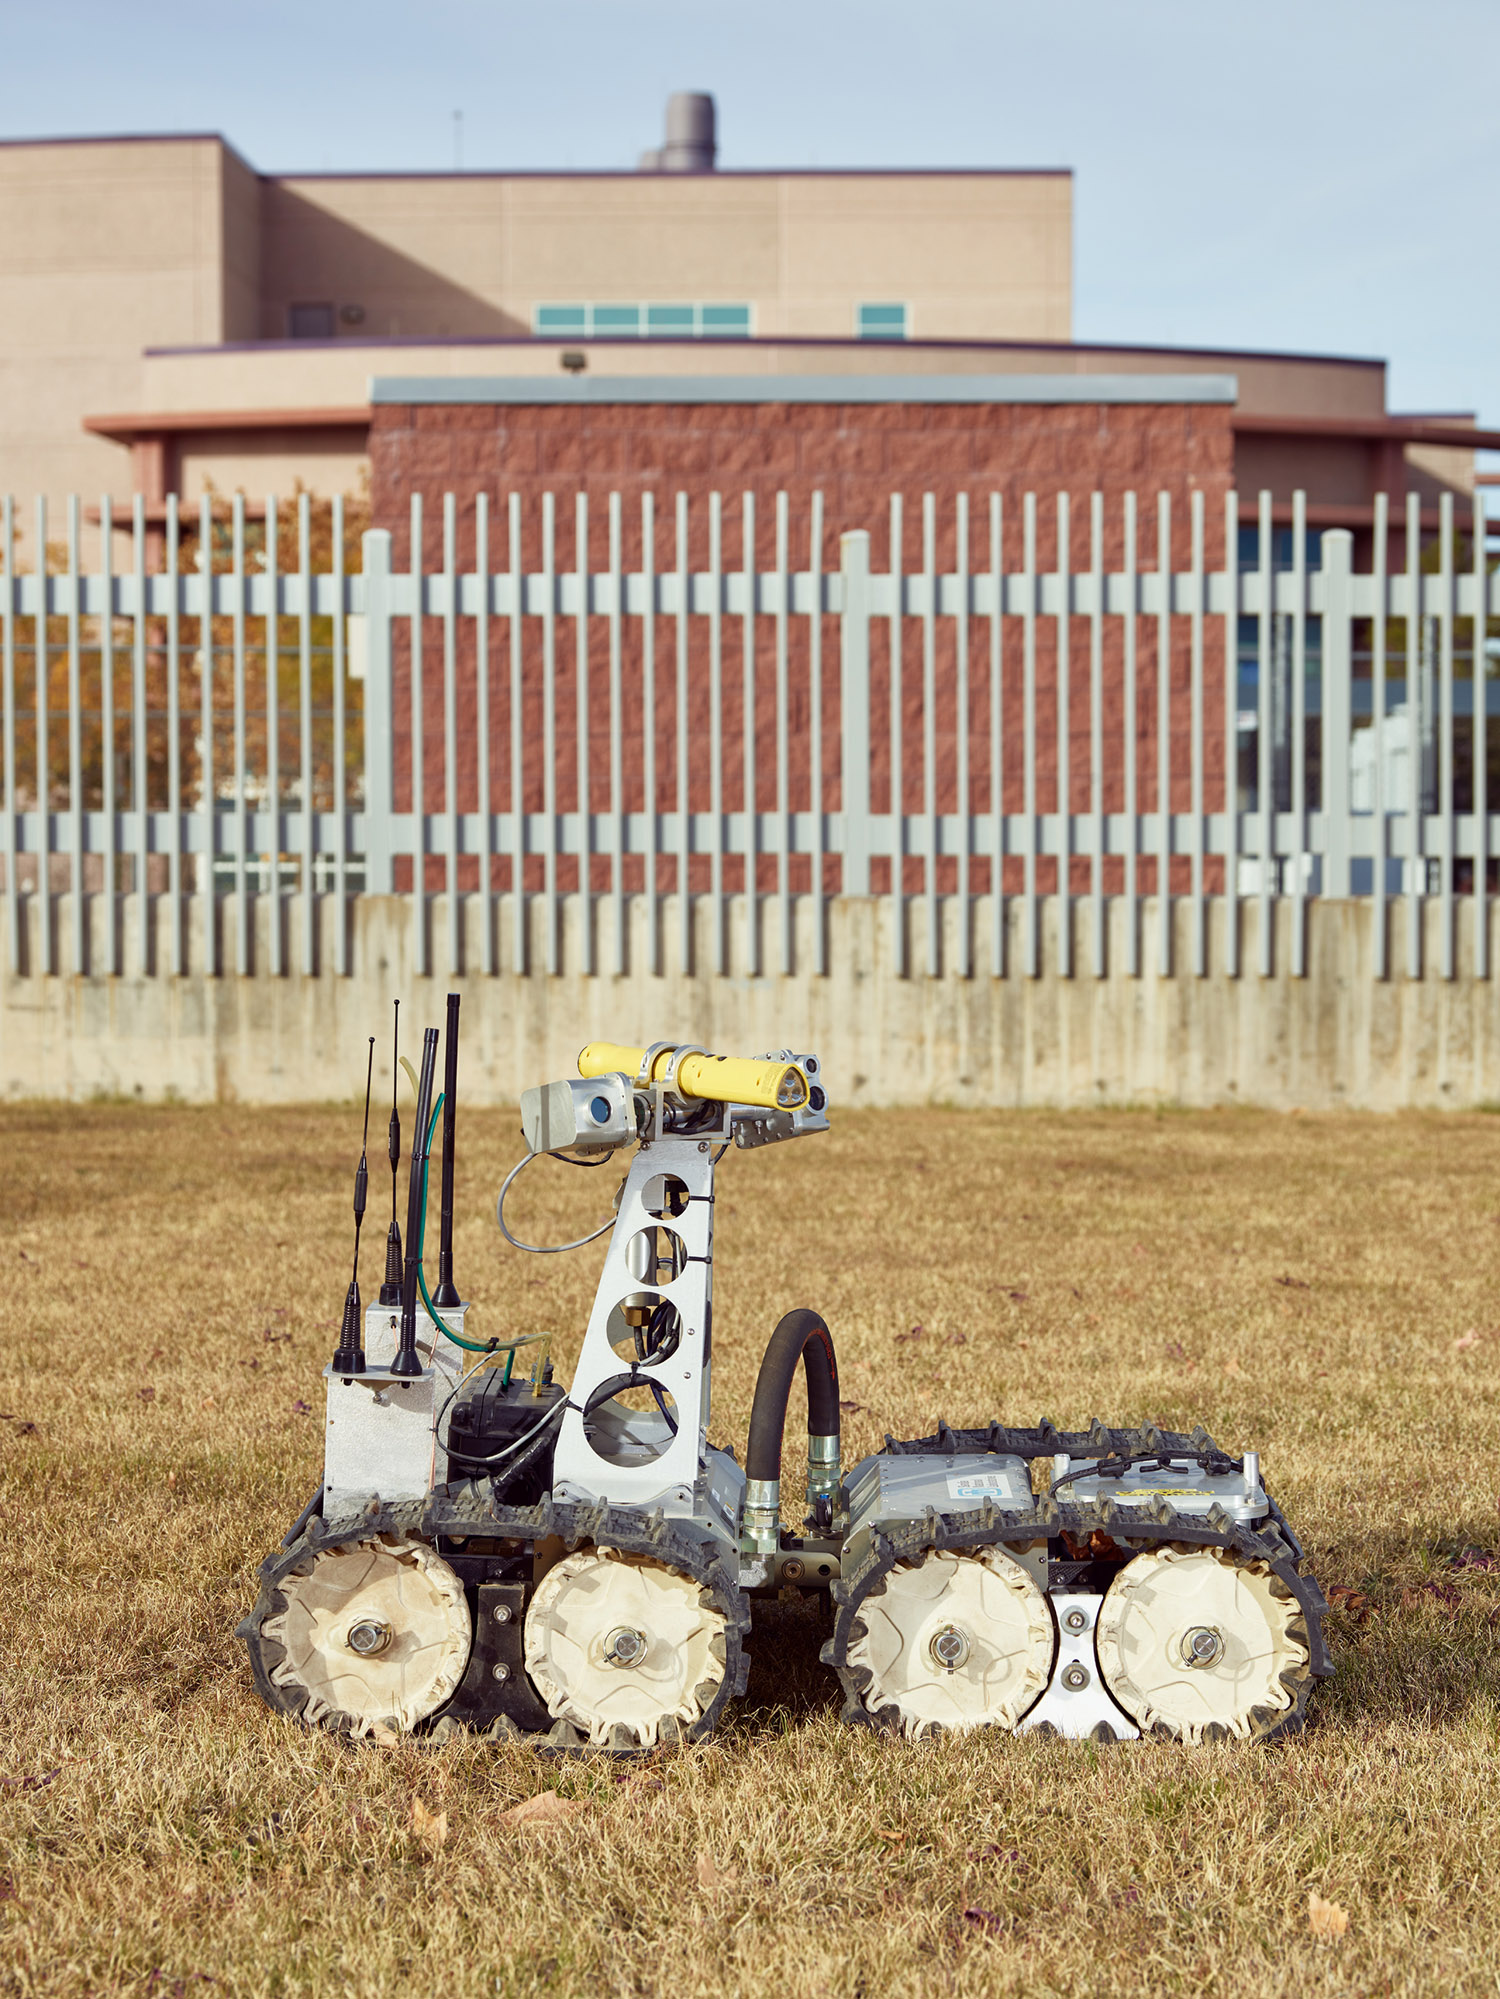 Gemini-Scout Mine Rescue Robot, Department of Energy, Sandia National Laboratories, Albuquerque, New Mexico, 2017